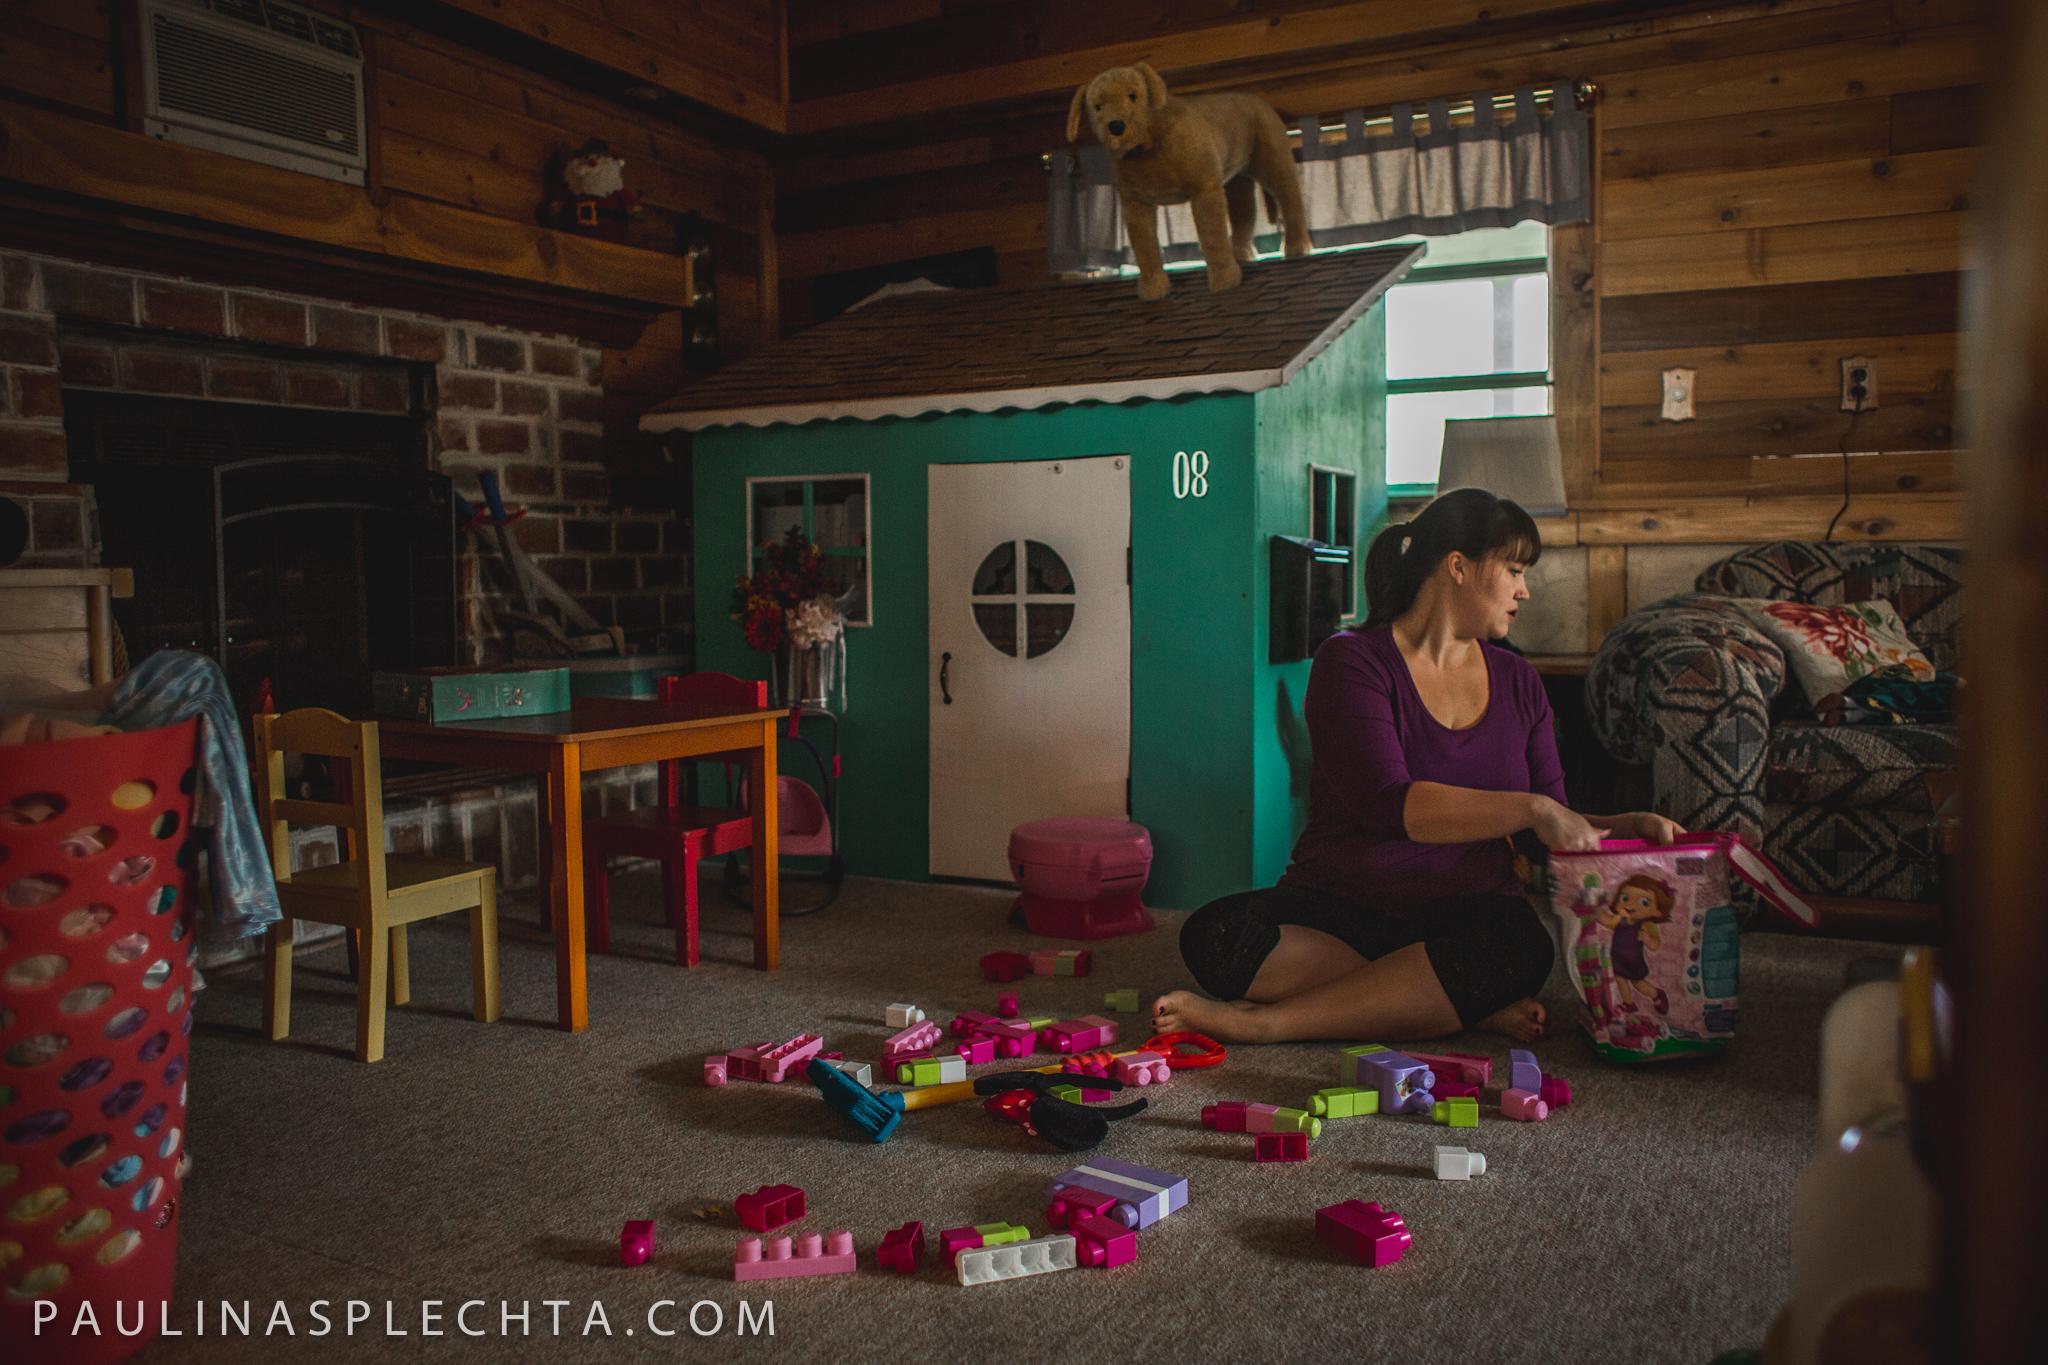 Family Photographer South Florida Pompano Broward Palm Beach Babies Baby Newborn Breastfeeding Birth Photograpy Beach Home Documentary Session-175.jpg